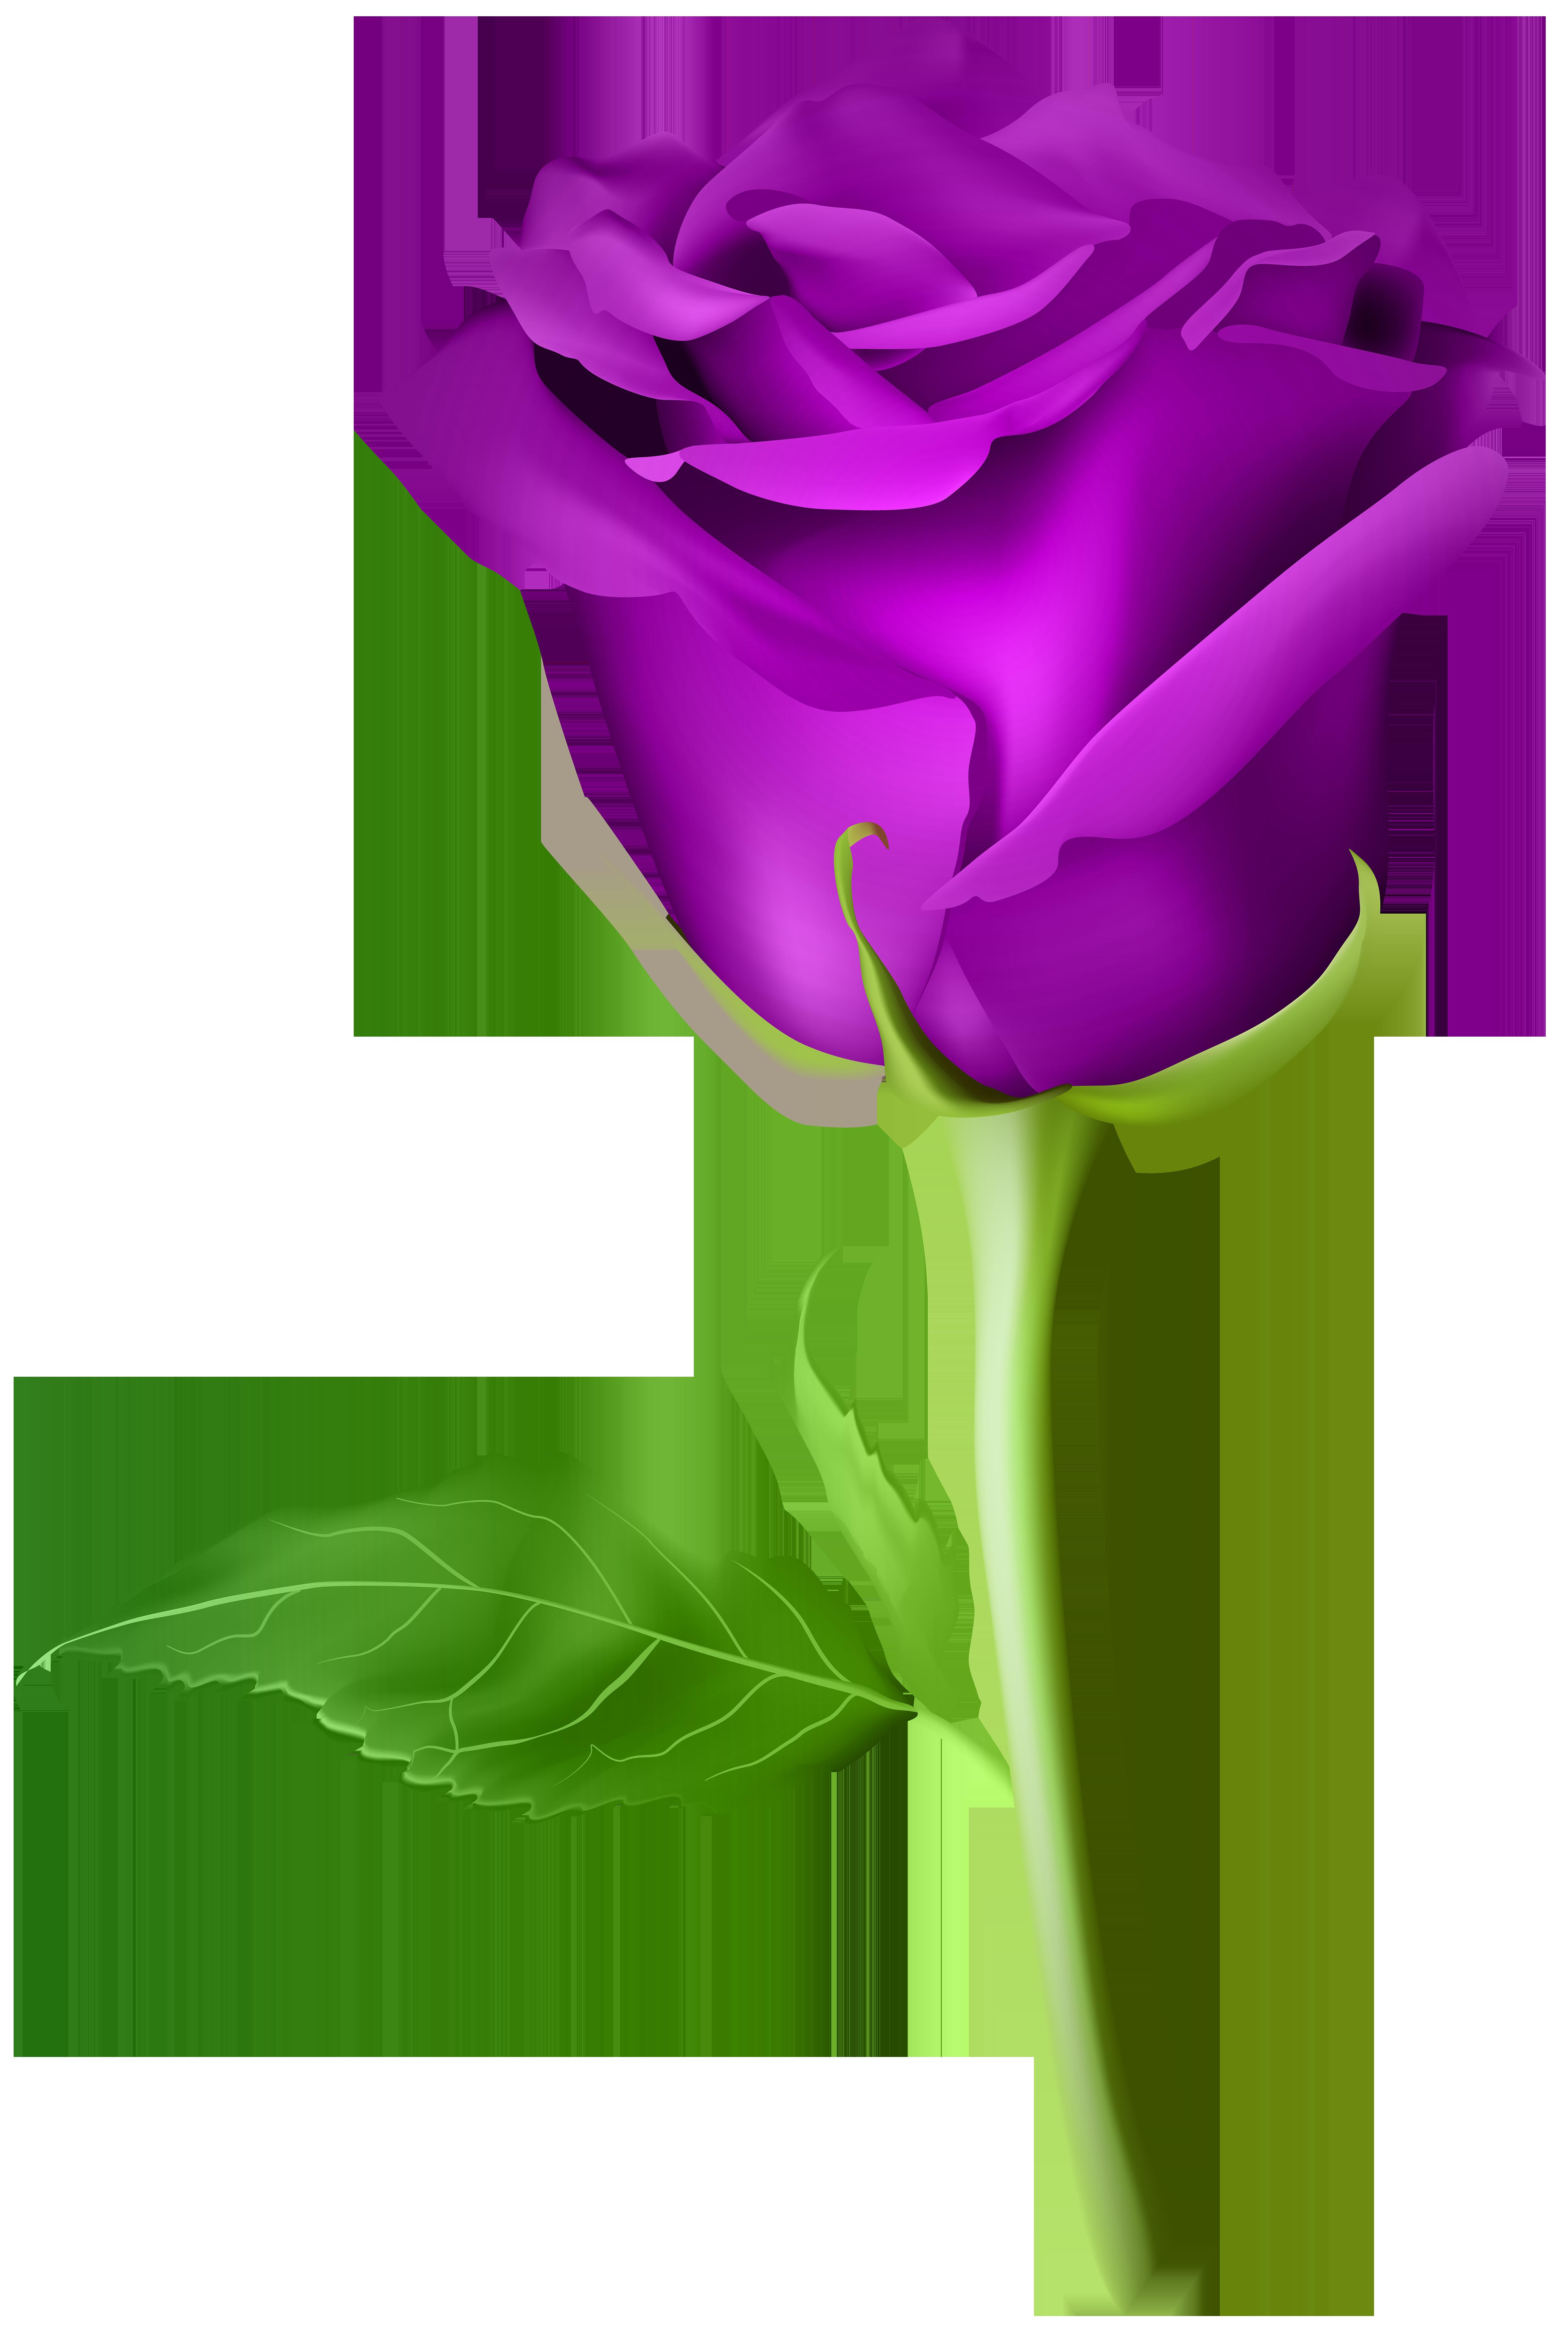 Blue and purple flower clipart image library download Blue rose Orange Clip art - art background 4721*7000 transprent Png ... image library download